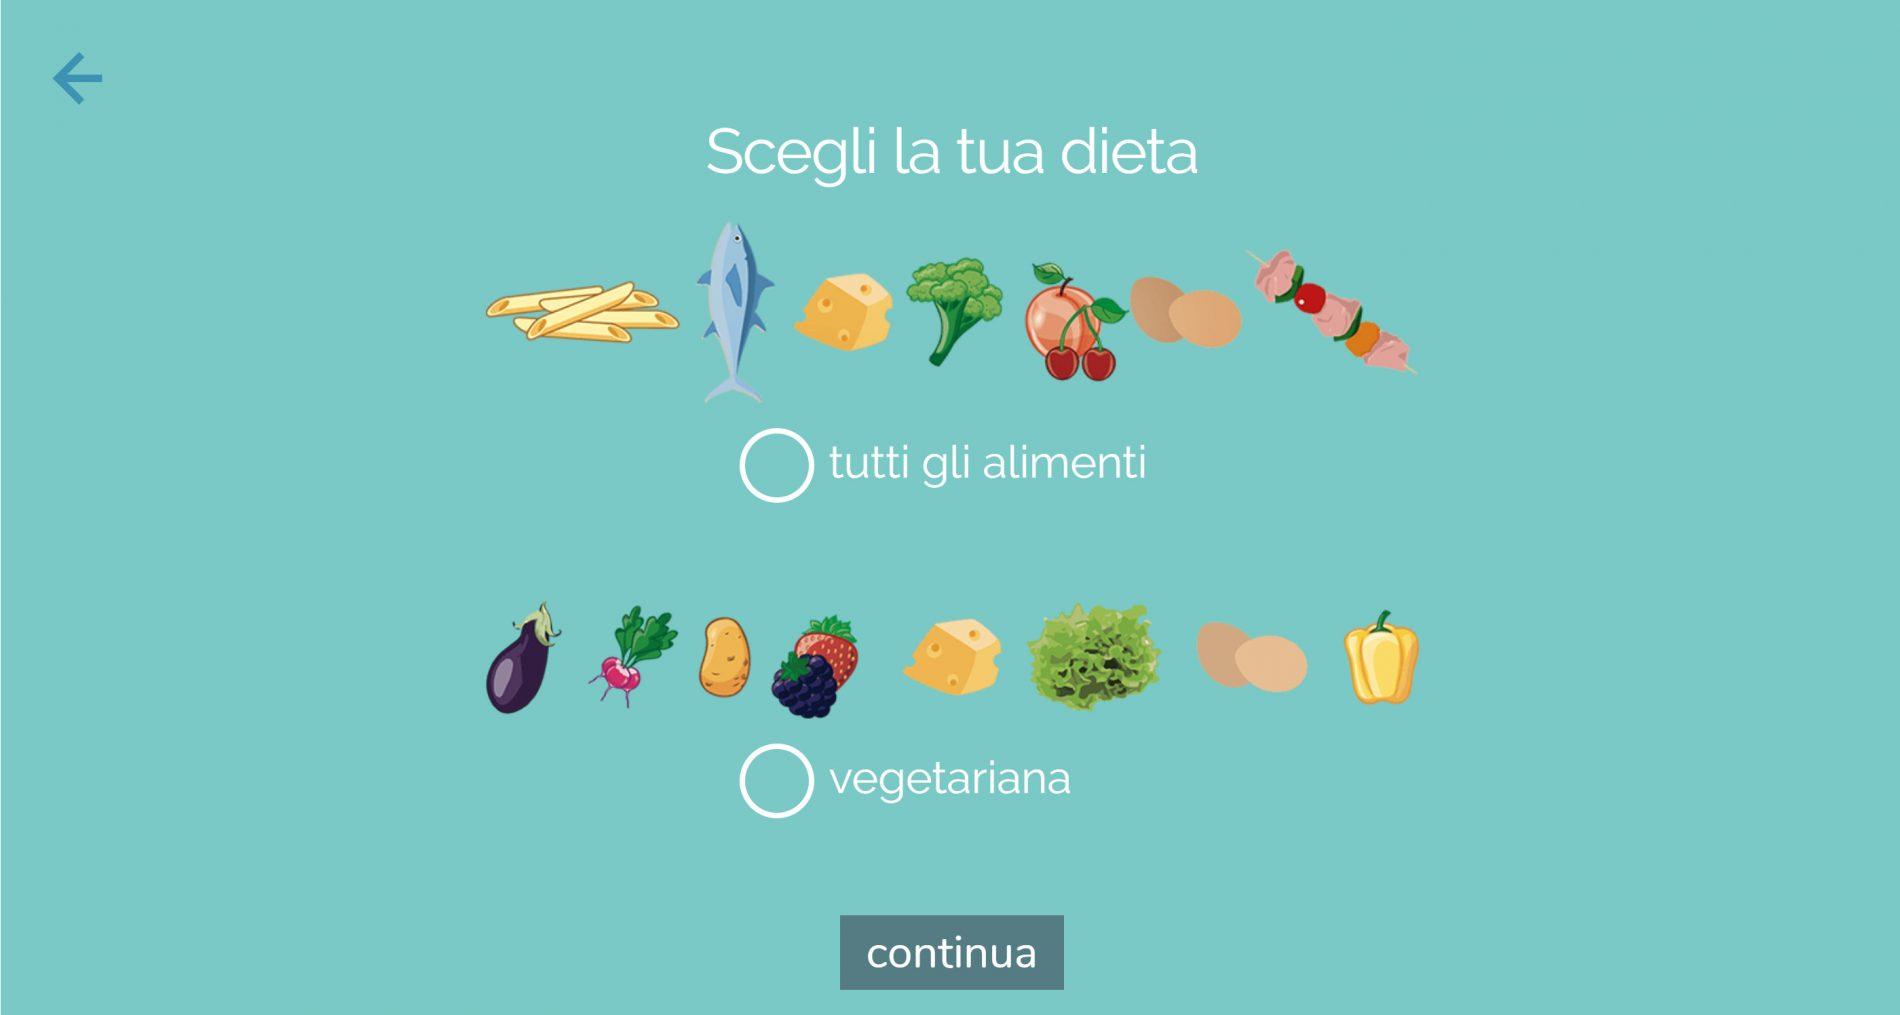 dieta melarossa guida iscrizione: scelta dieta onnivora o vegetariana